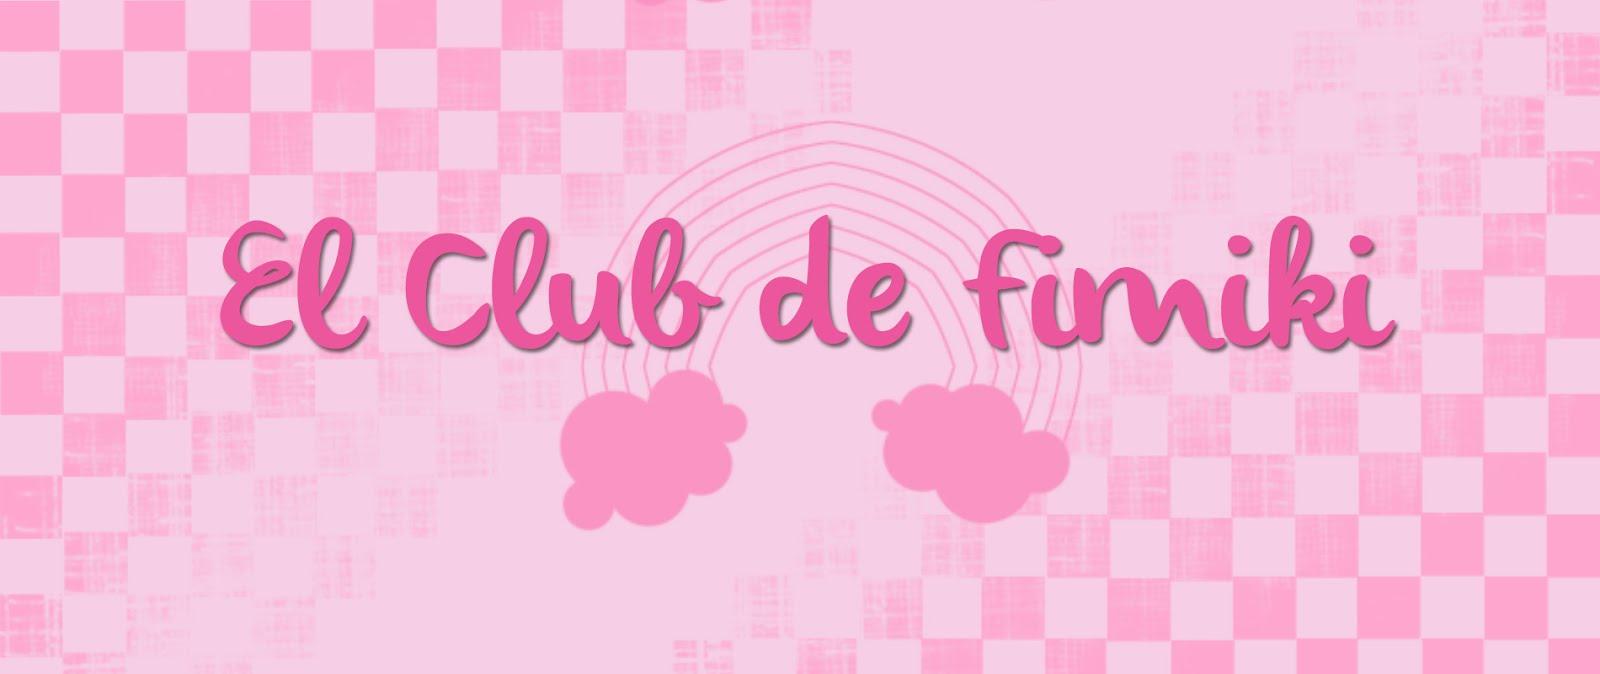 Participo en Retos del Club de Fimiki